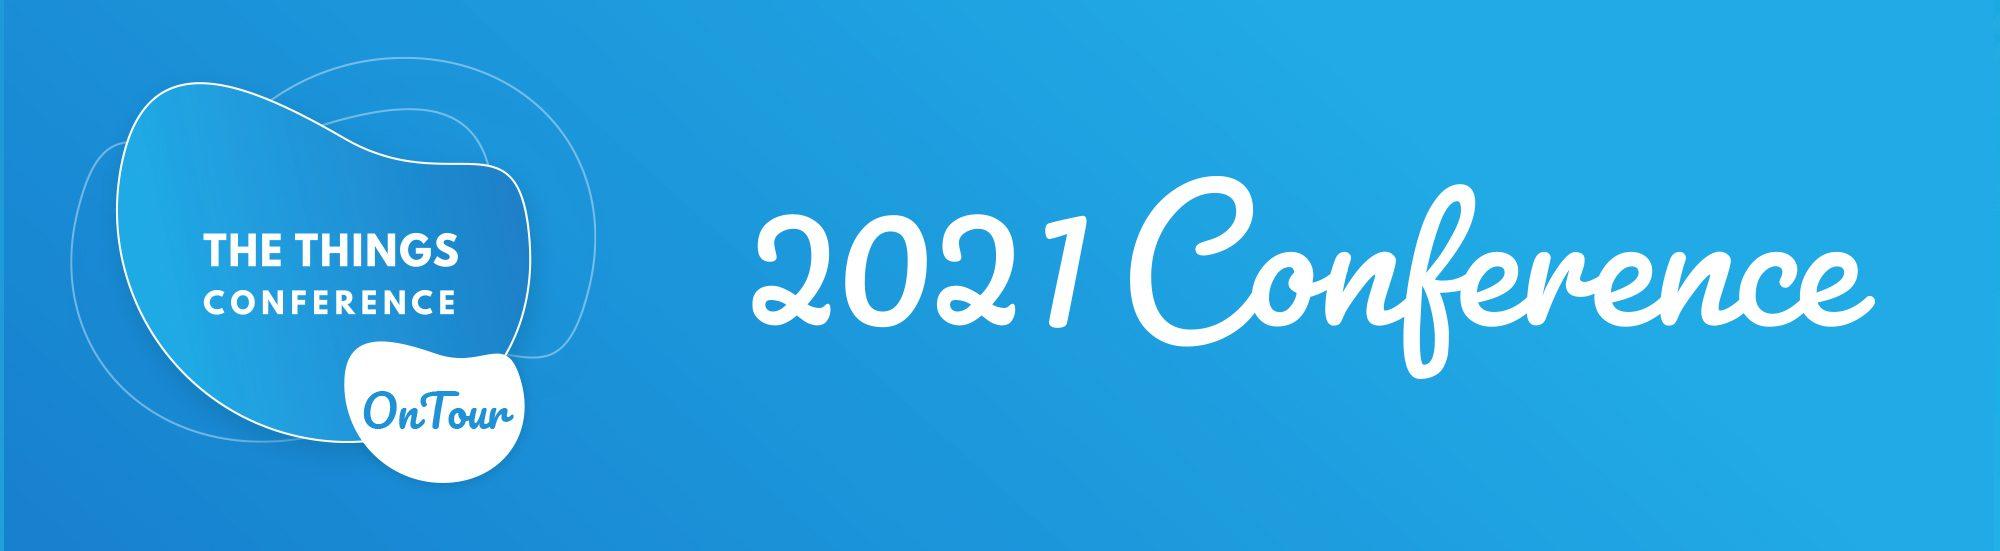 ttn_conference_2021_logo